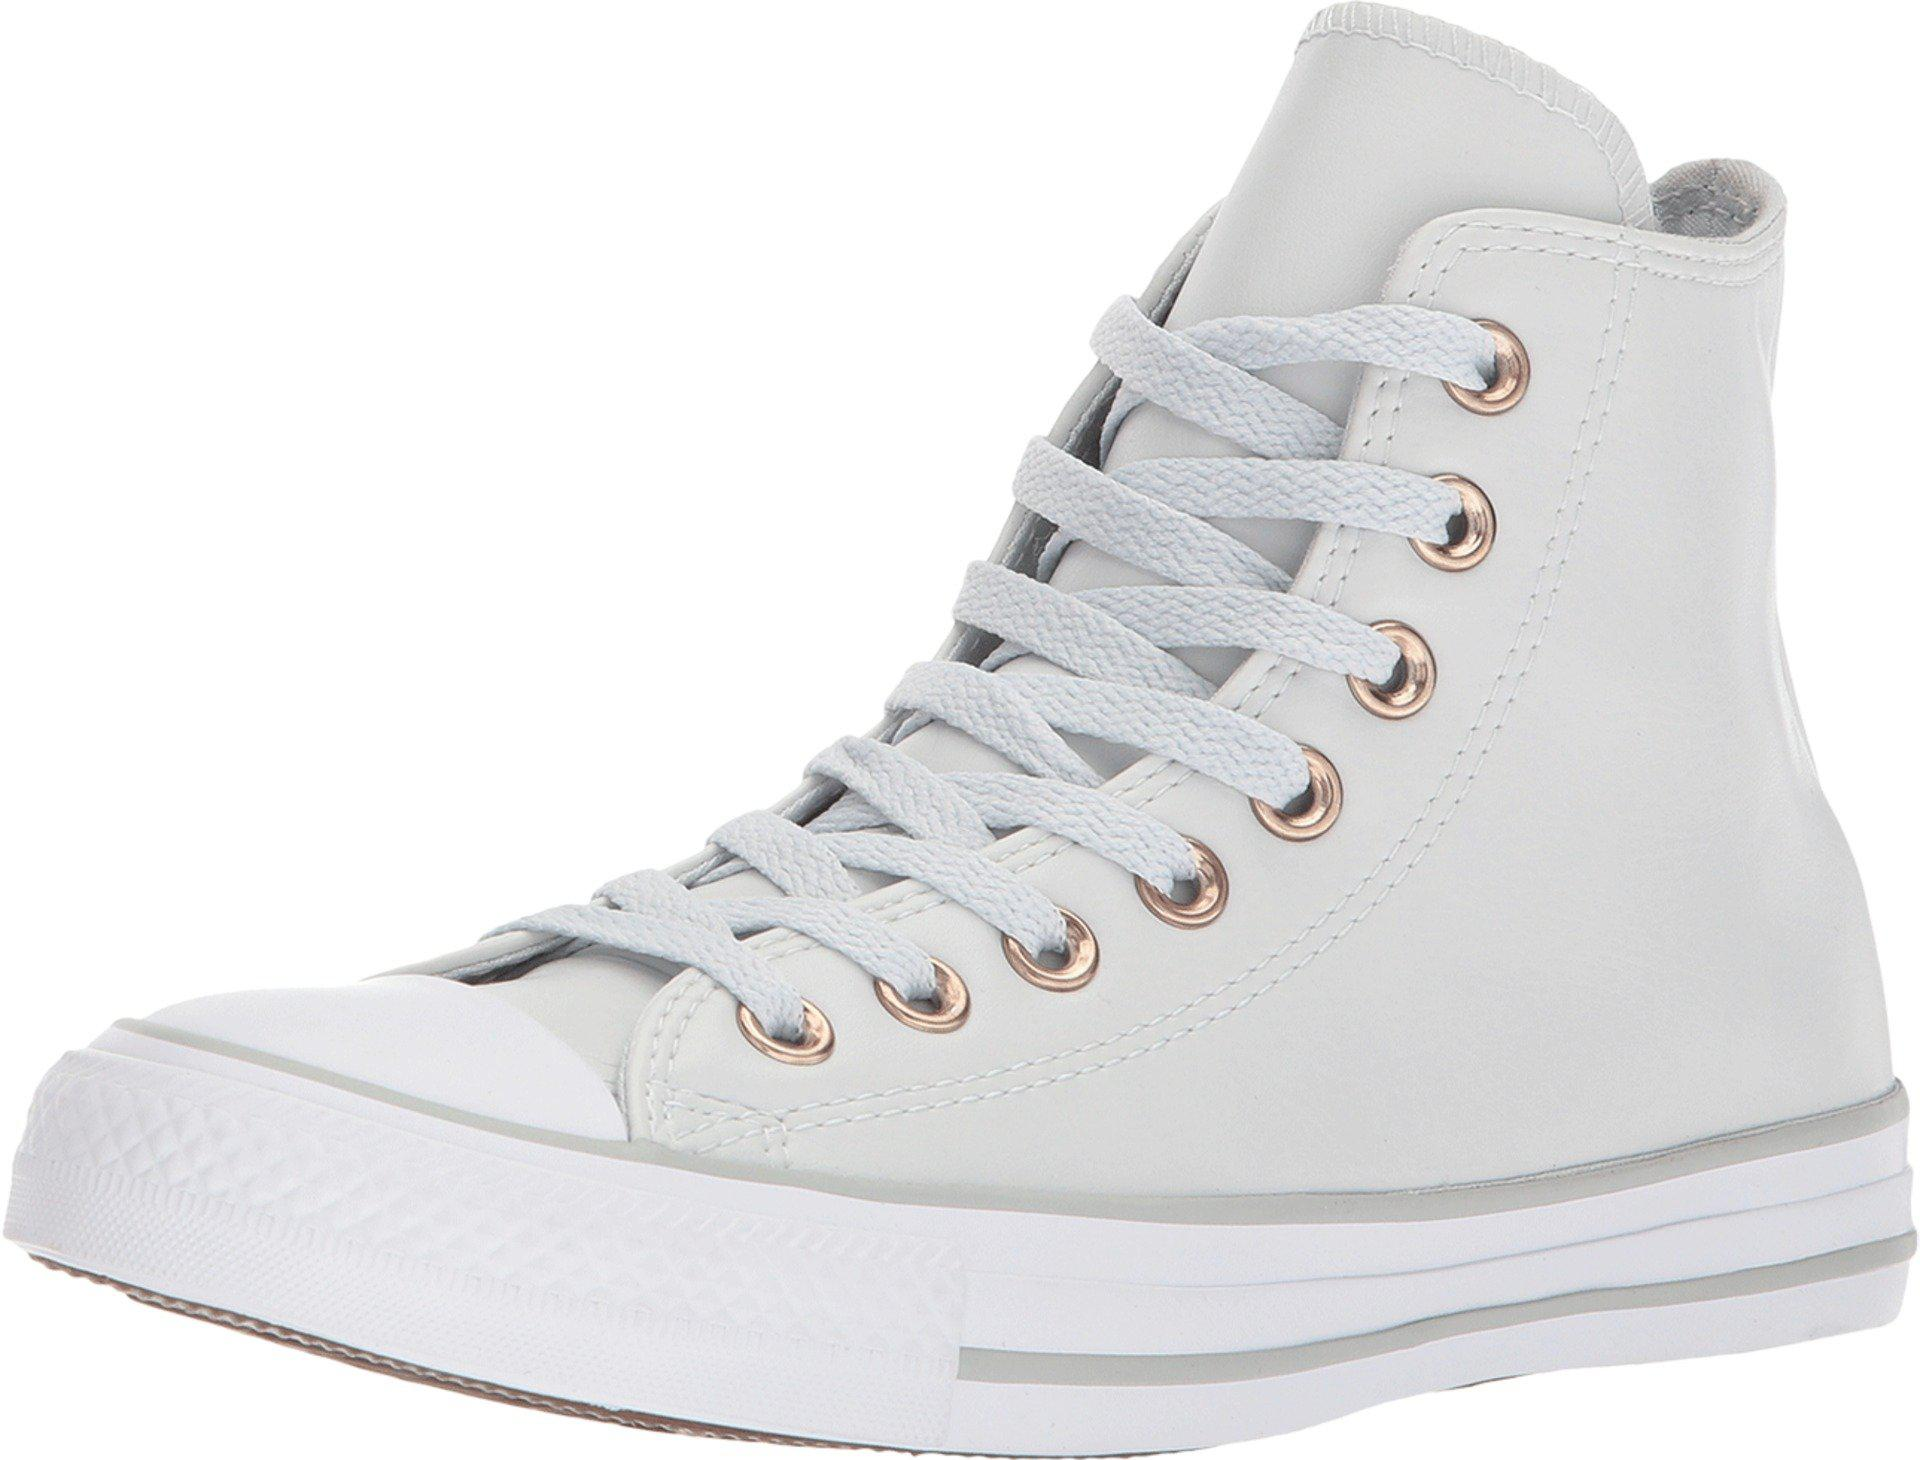 Converse Chuck Taylor® All Star Craft Neutral Leather Hi ShJjs